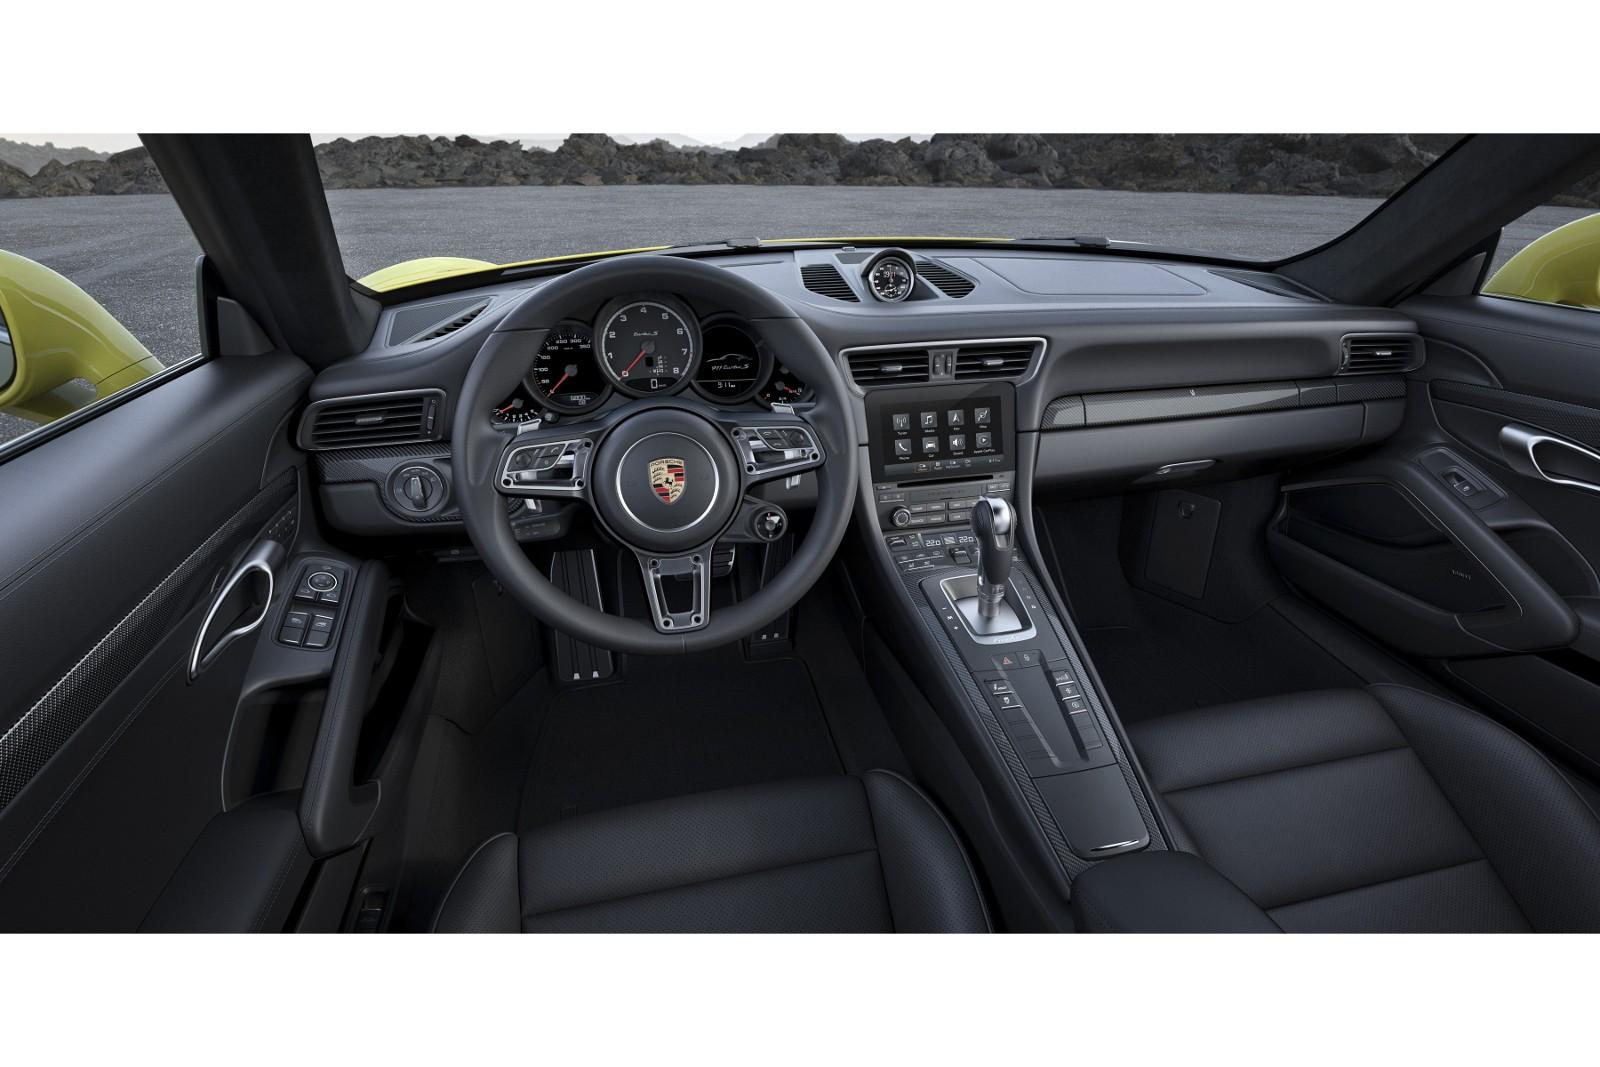 2017 porsche 911 turbo turbo s pack a 20 hp premium have. Black Bedroom Furniture Sets. Home Design Ideas